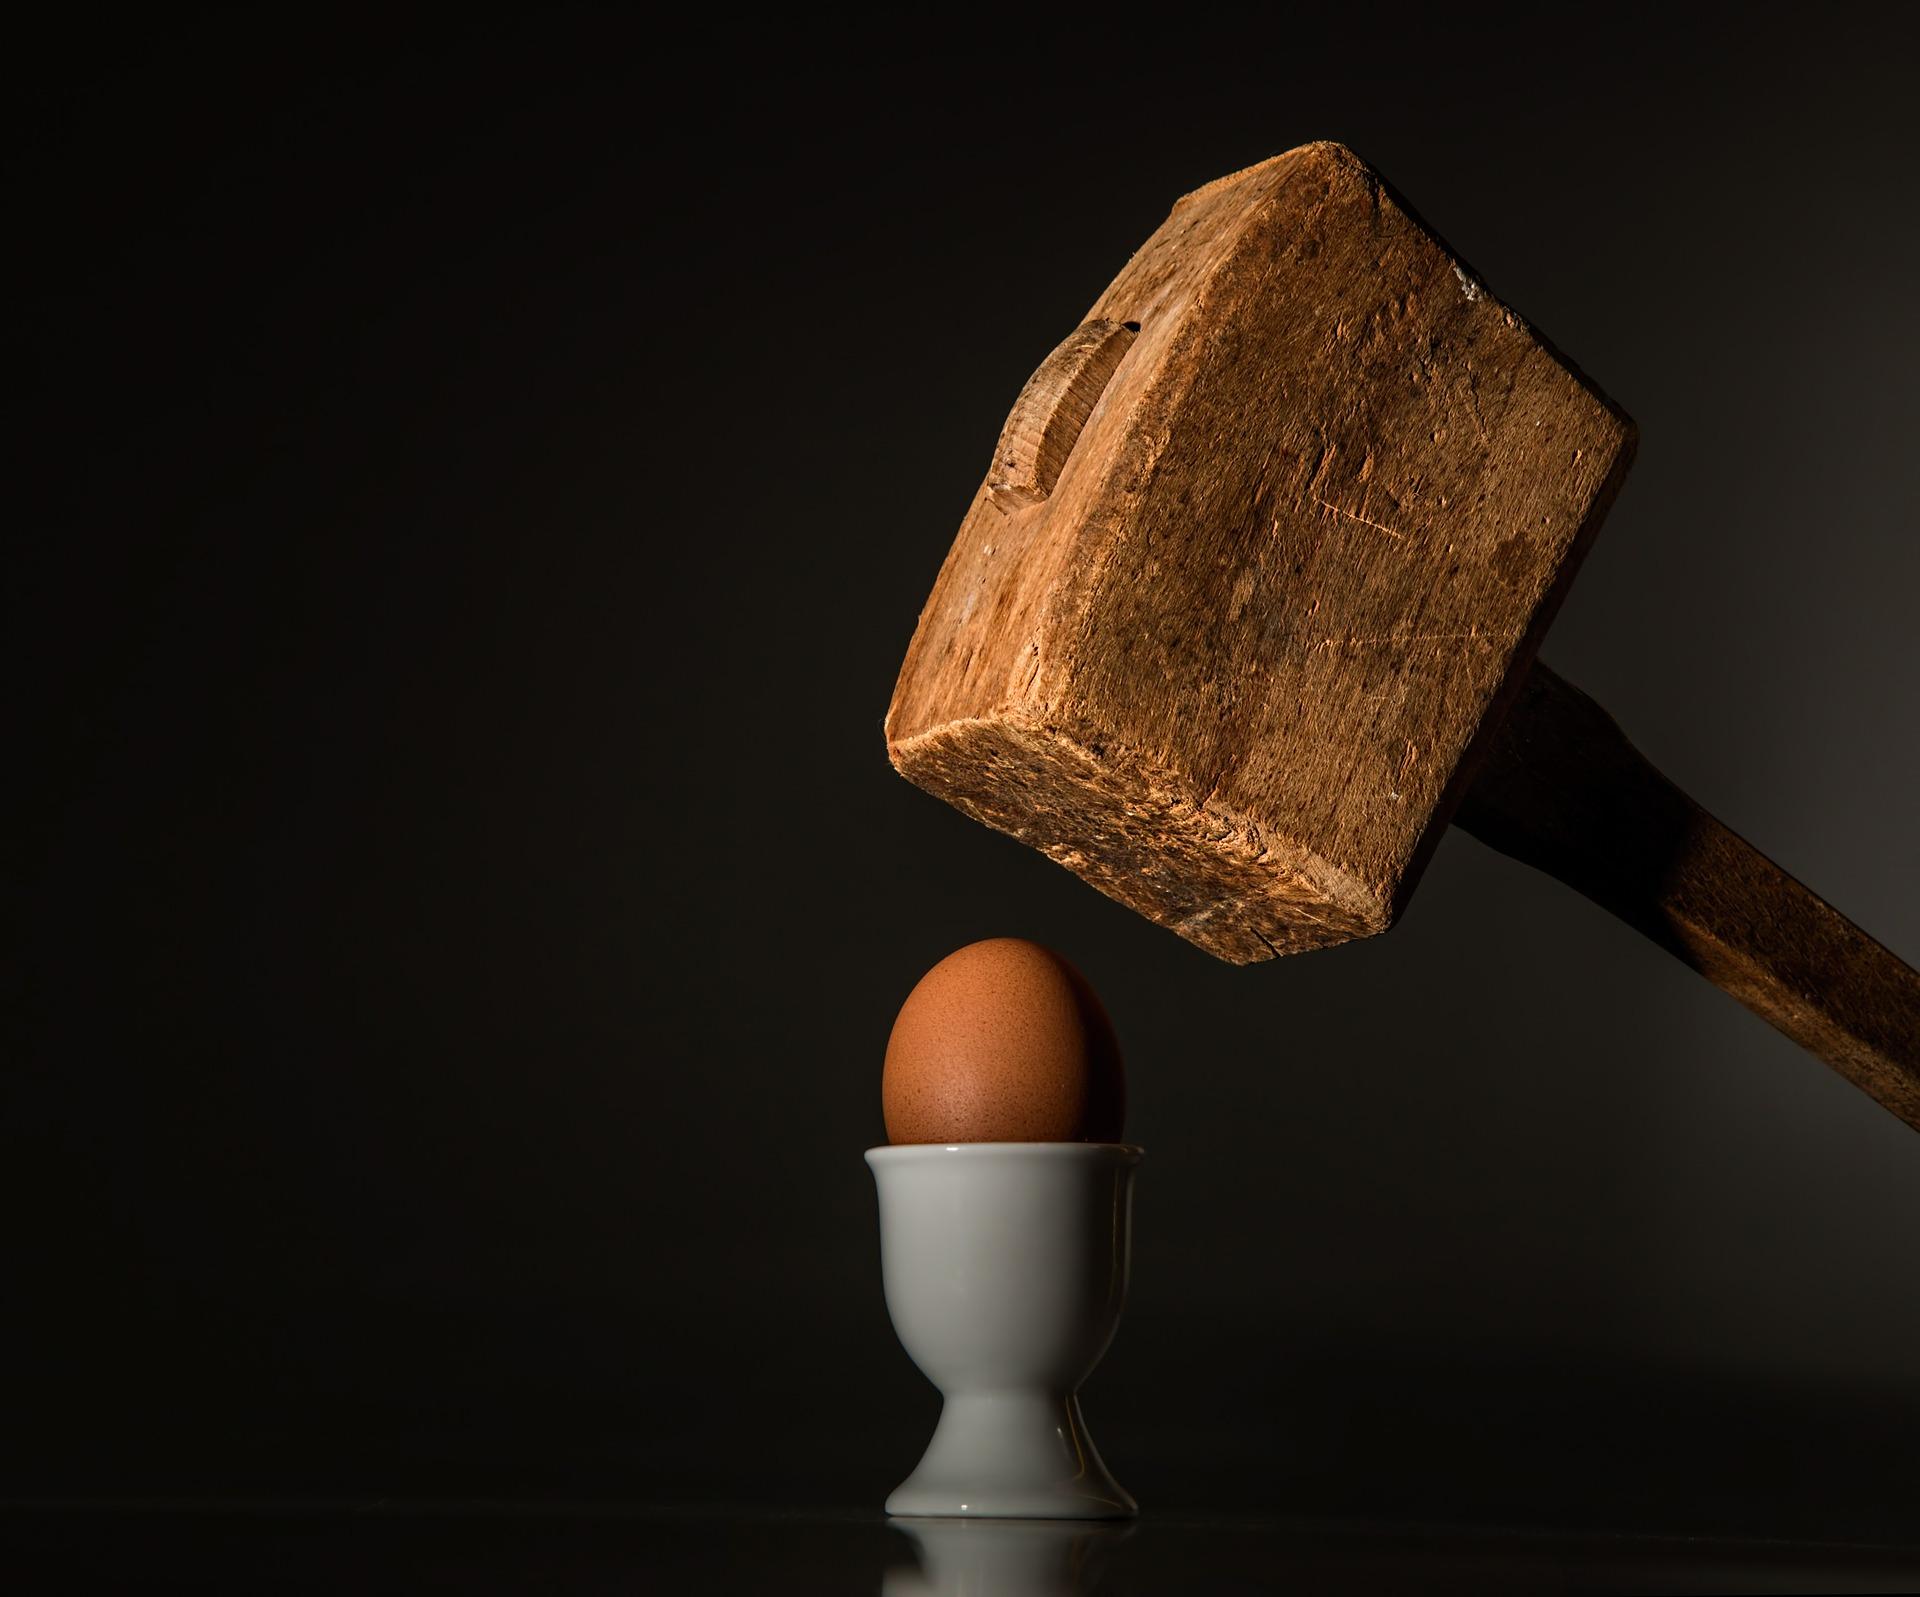 gdy ktoś cię atakuje pixabay egg-583163_1920